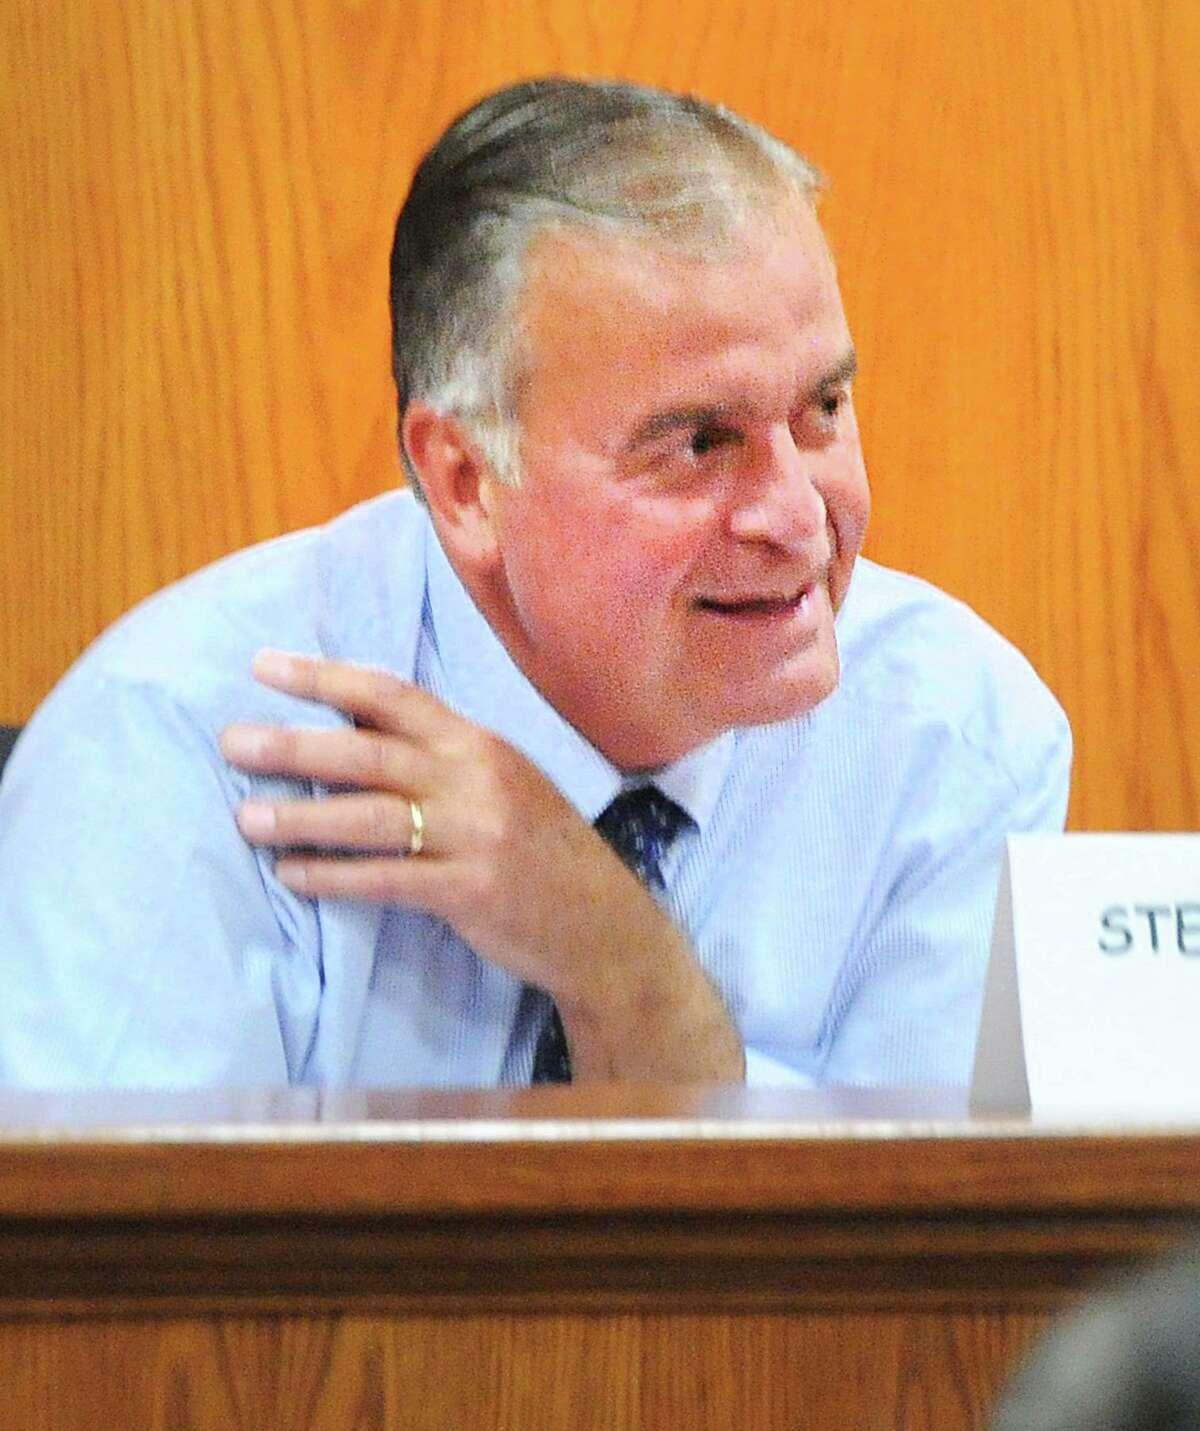 State Rep. Stephen Meskers (D-150).